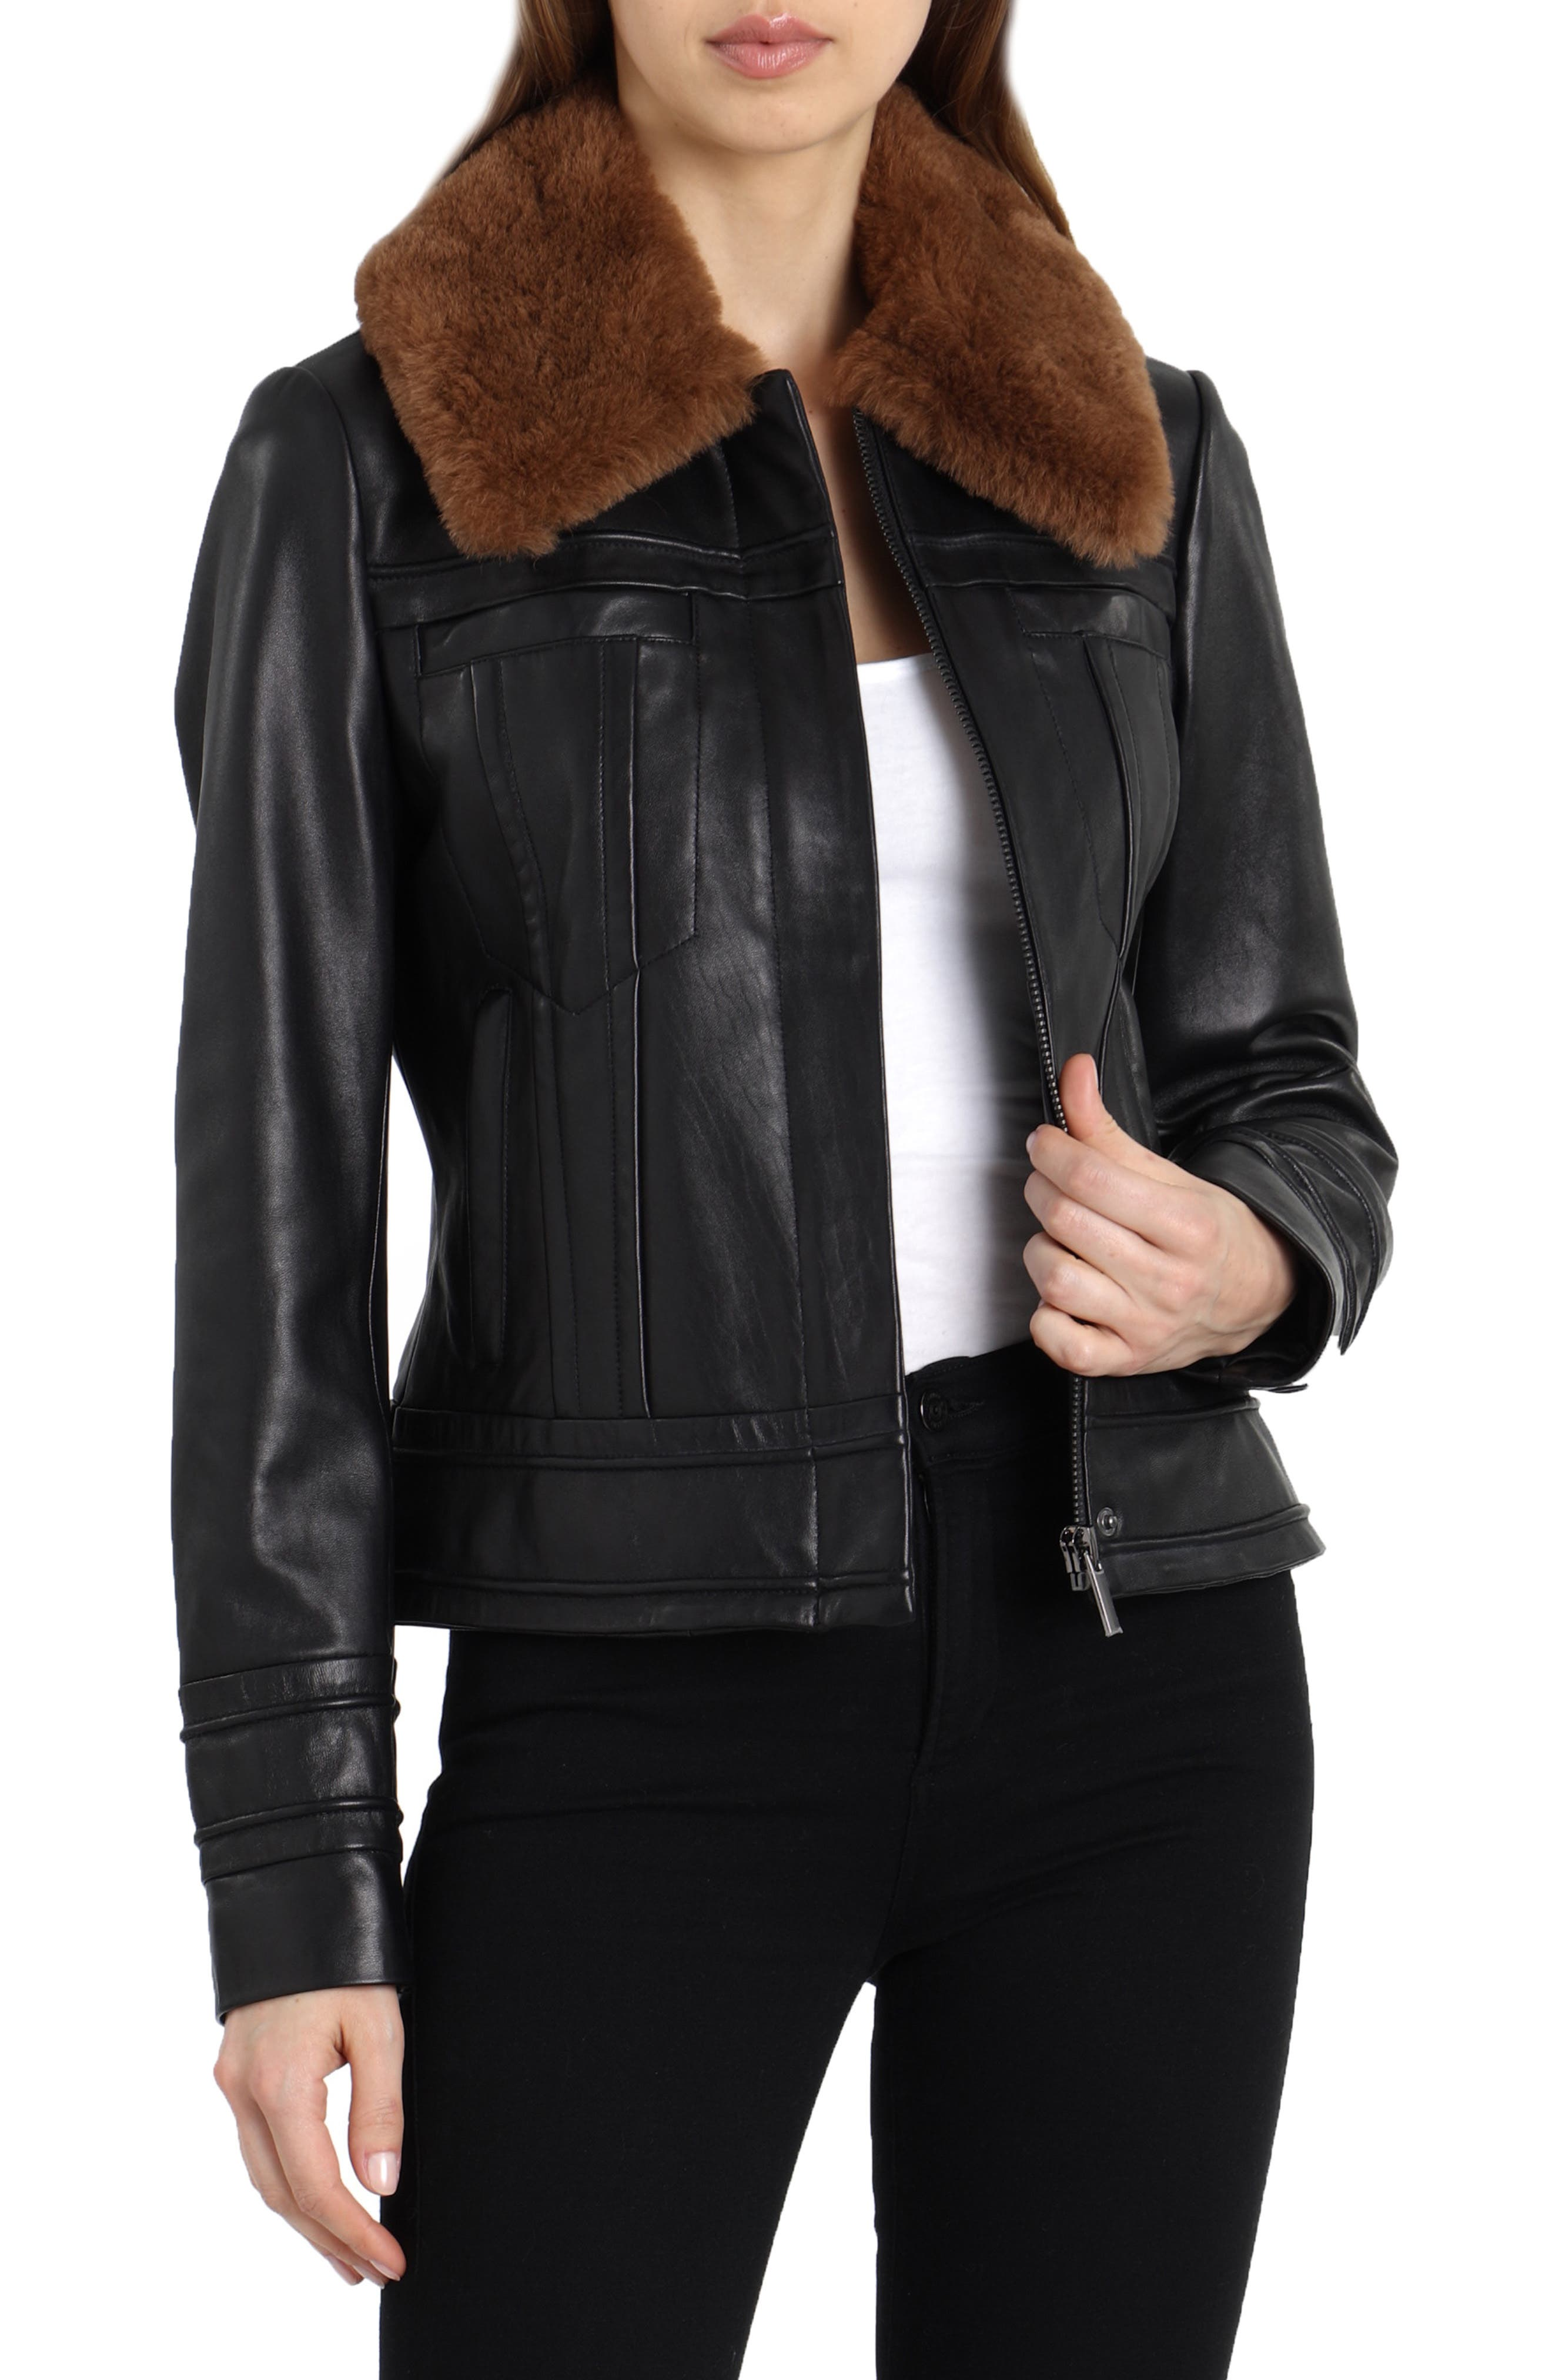 Badgley Mischka Leather Aviator Jacket With Genuine Shearling